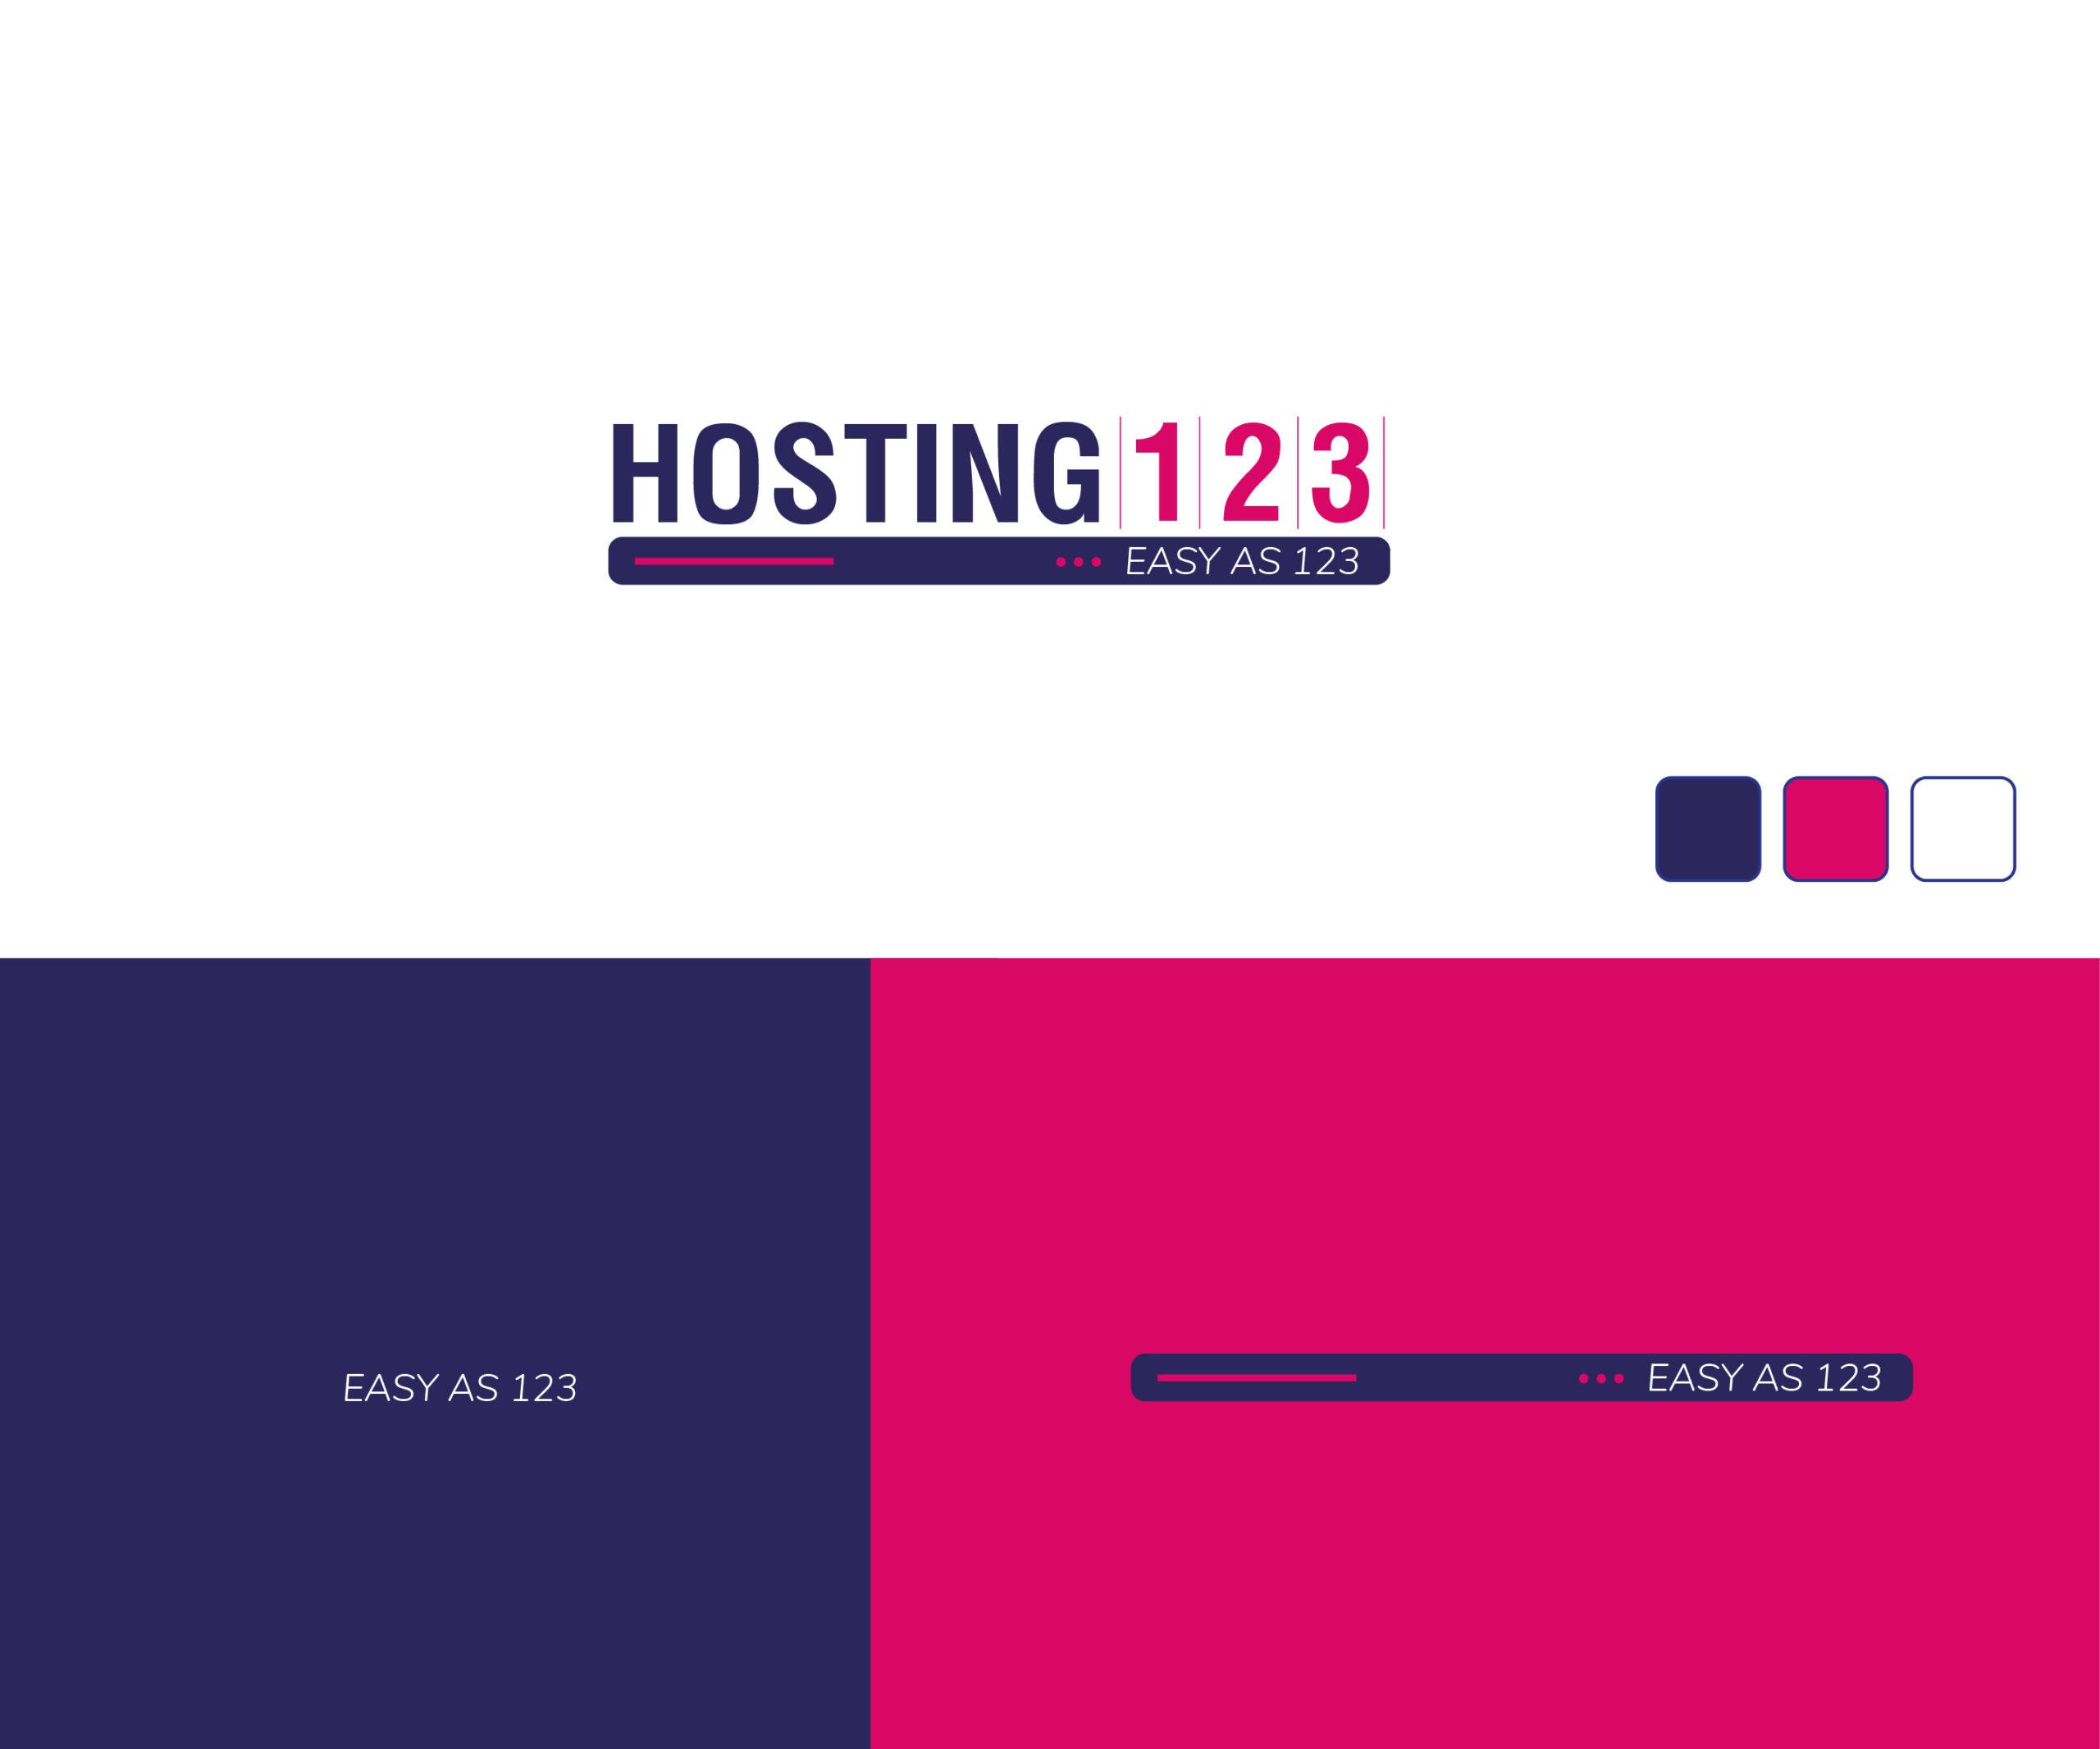 Branding project for hosting 123